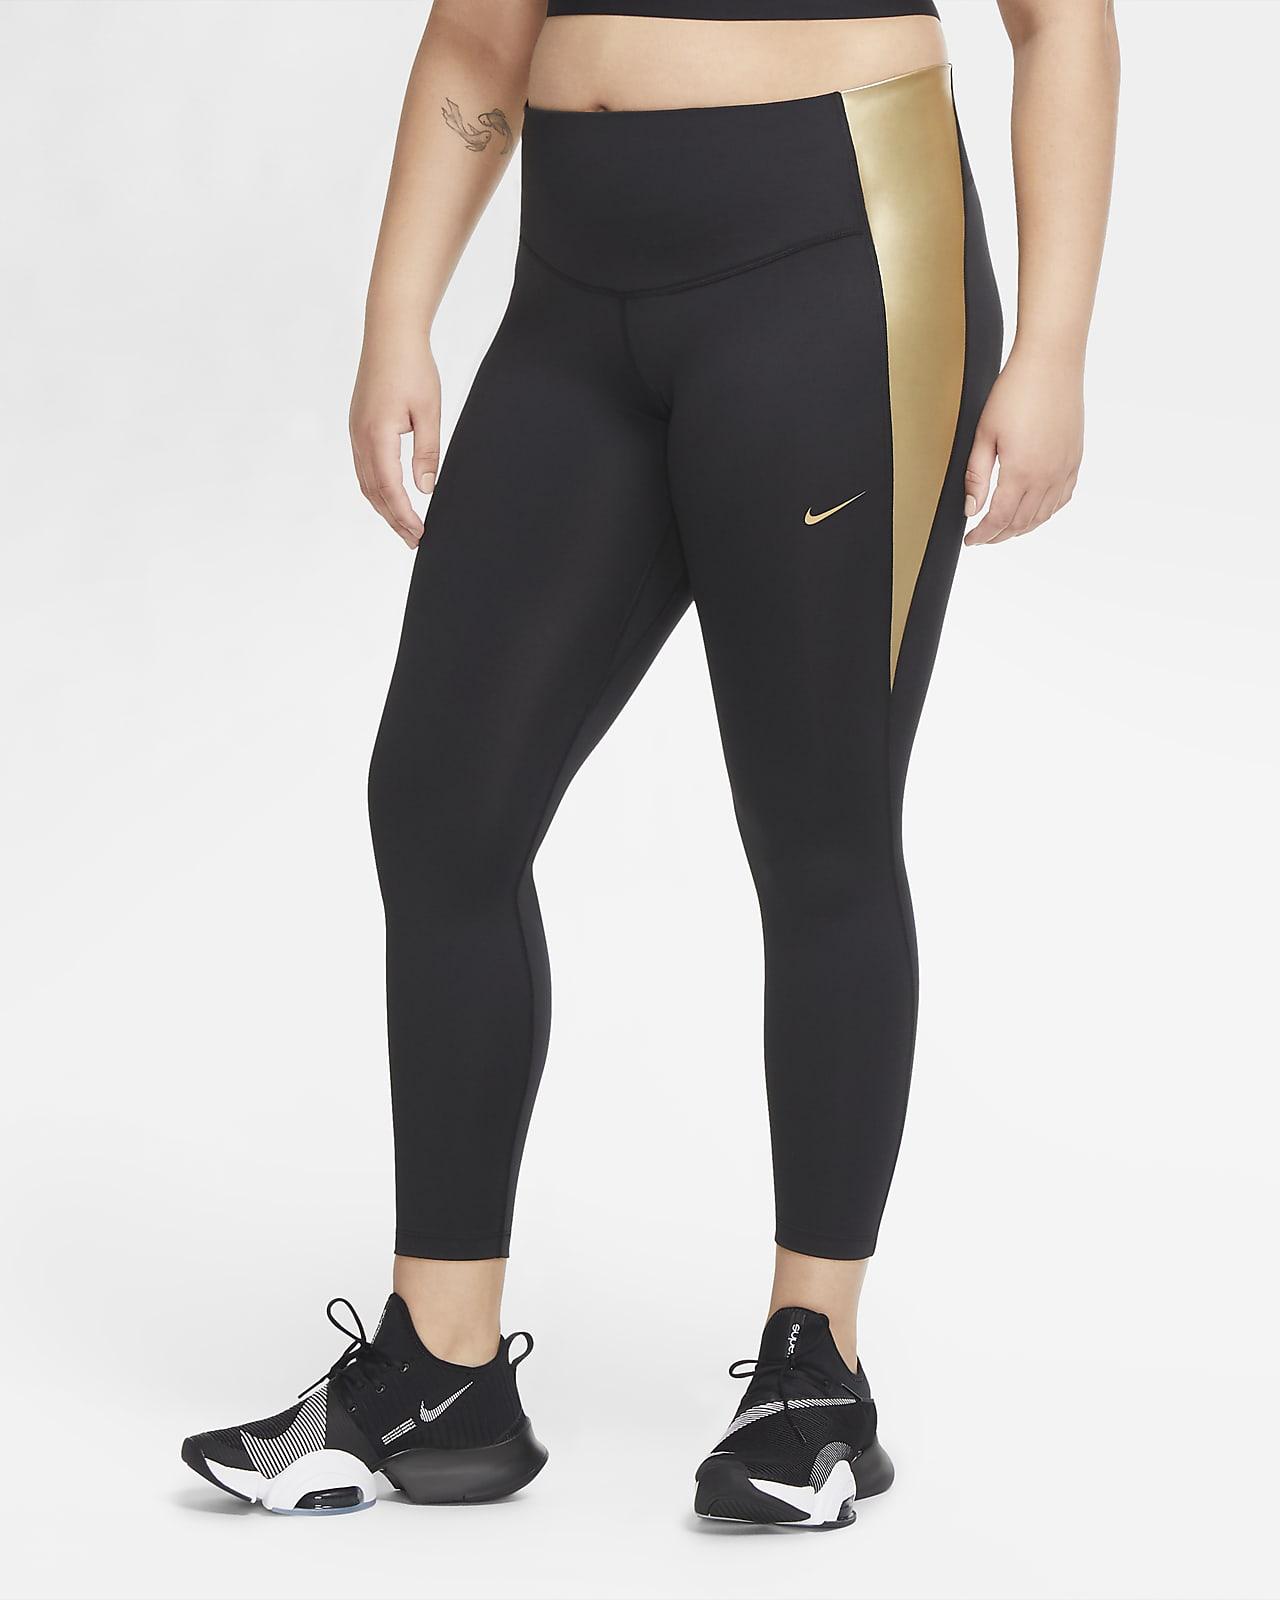 Nike One Damen-Tights (große Größe)